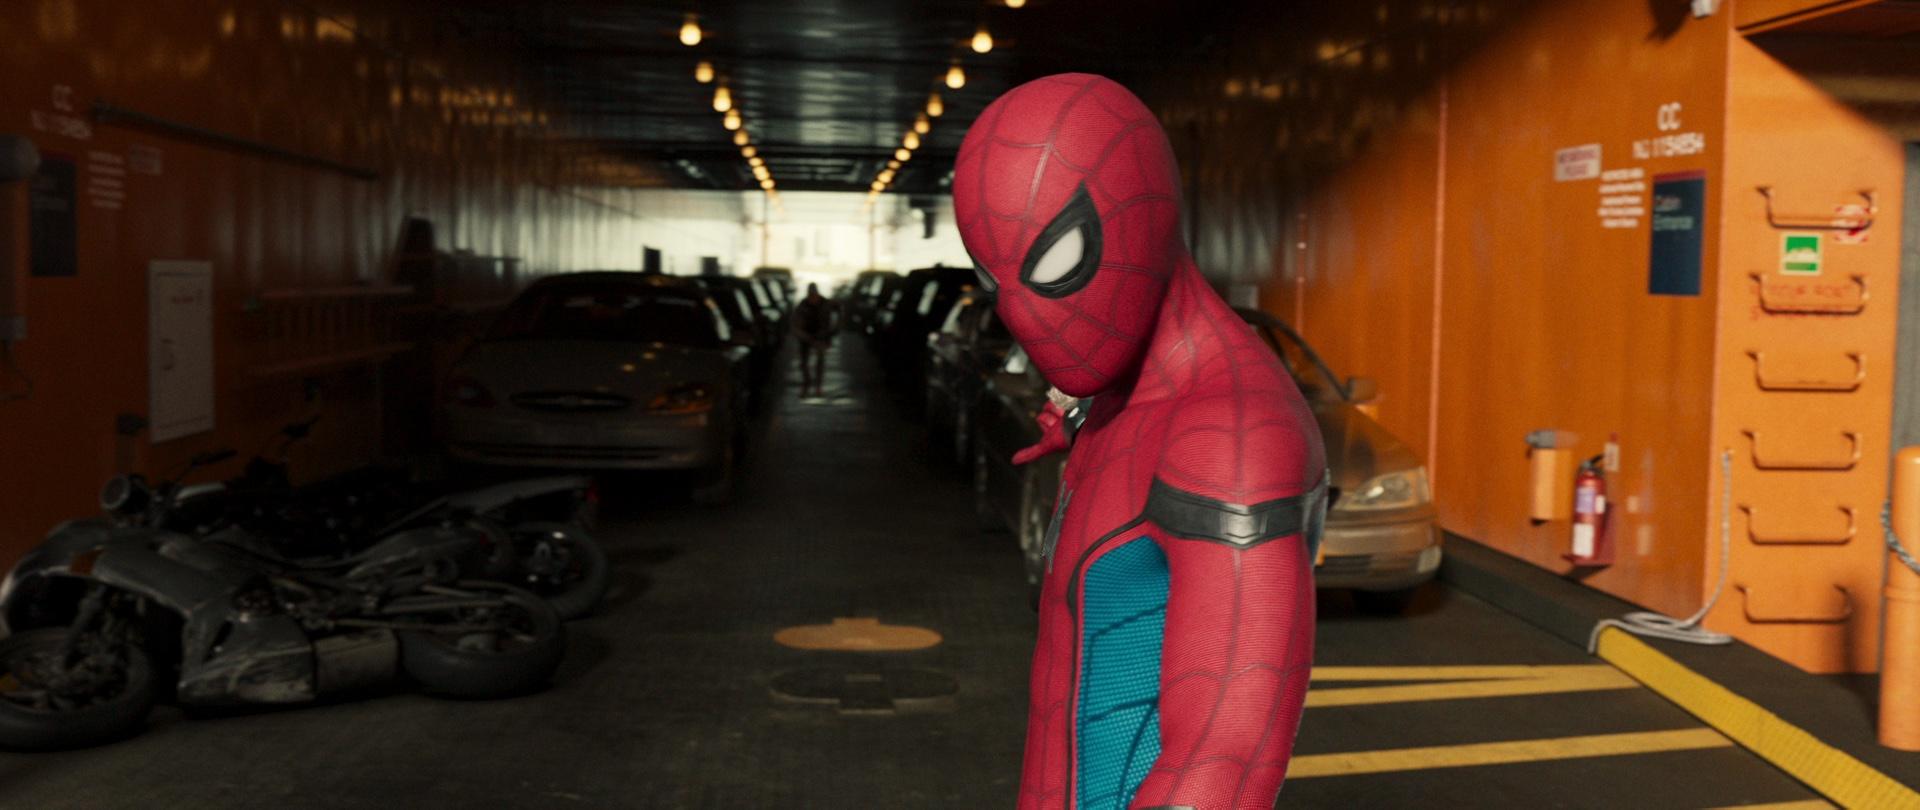 spider-man-homecoming-trailer-2-hd-screencaps-1